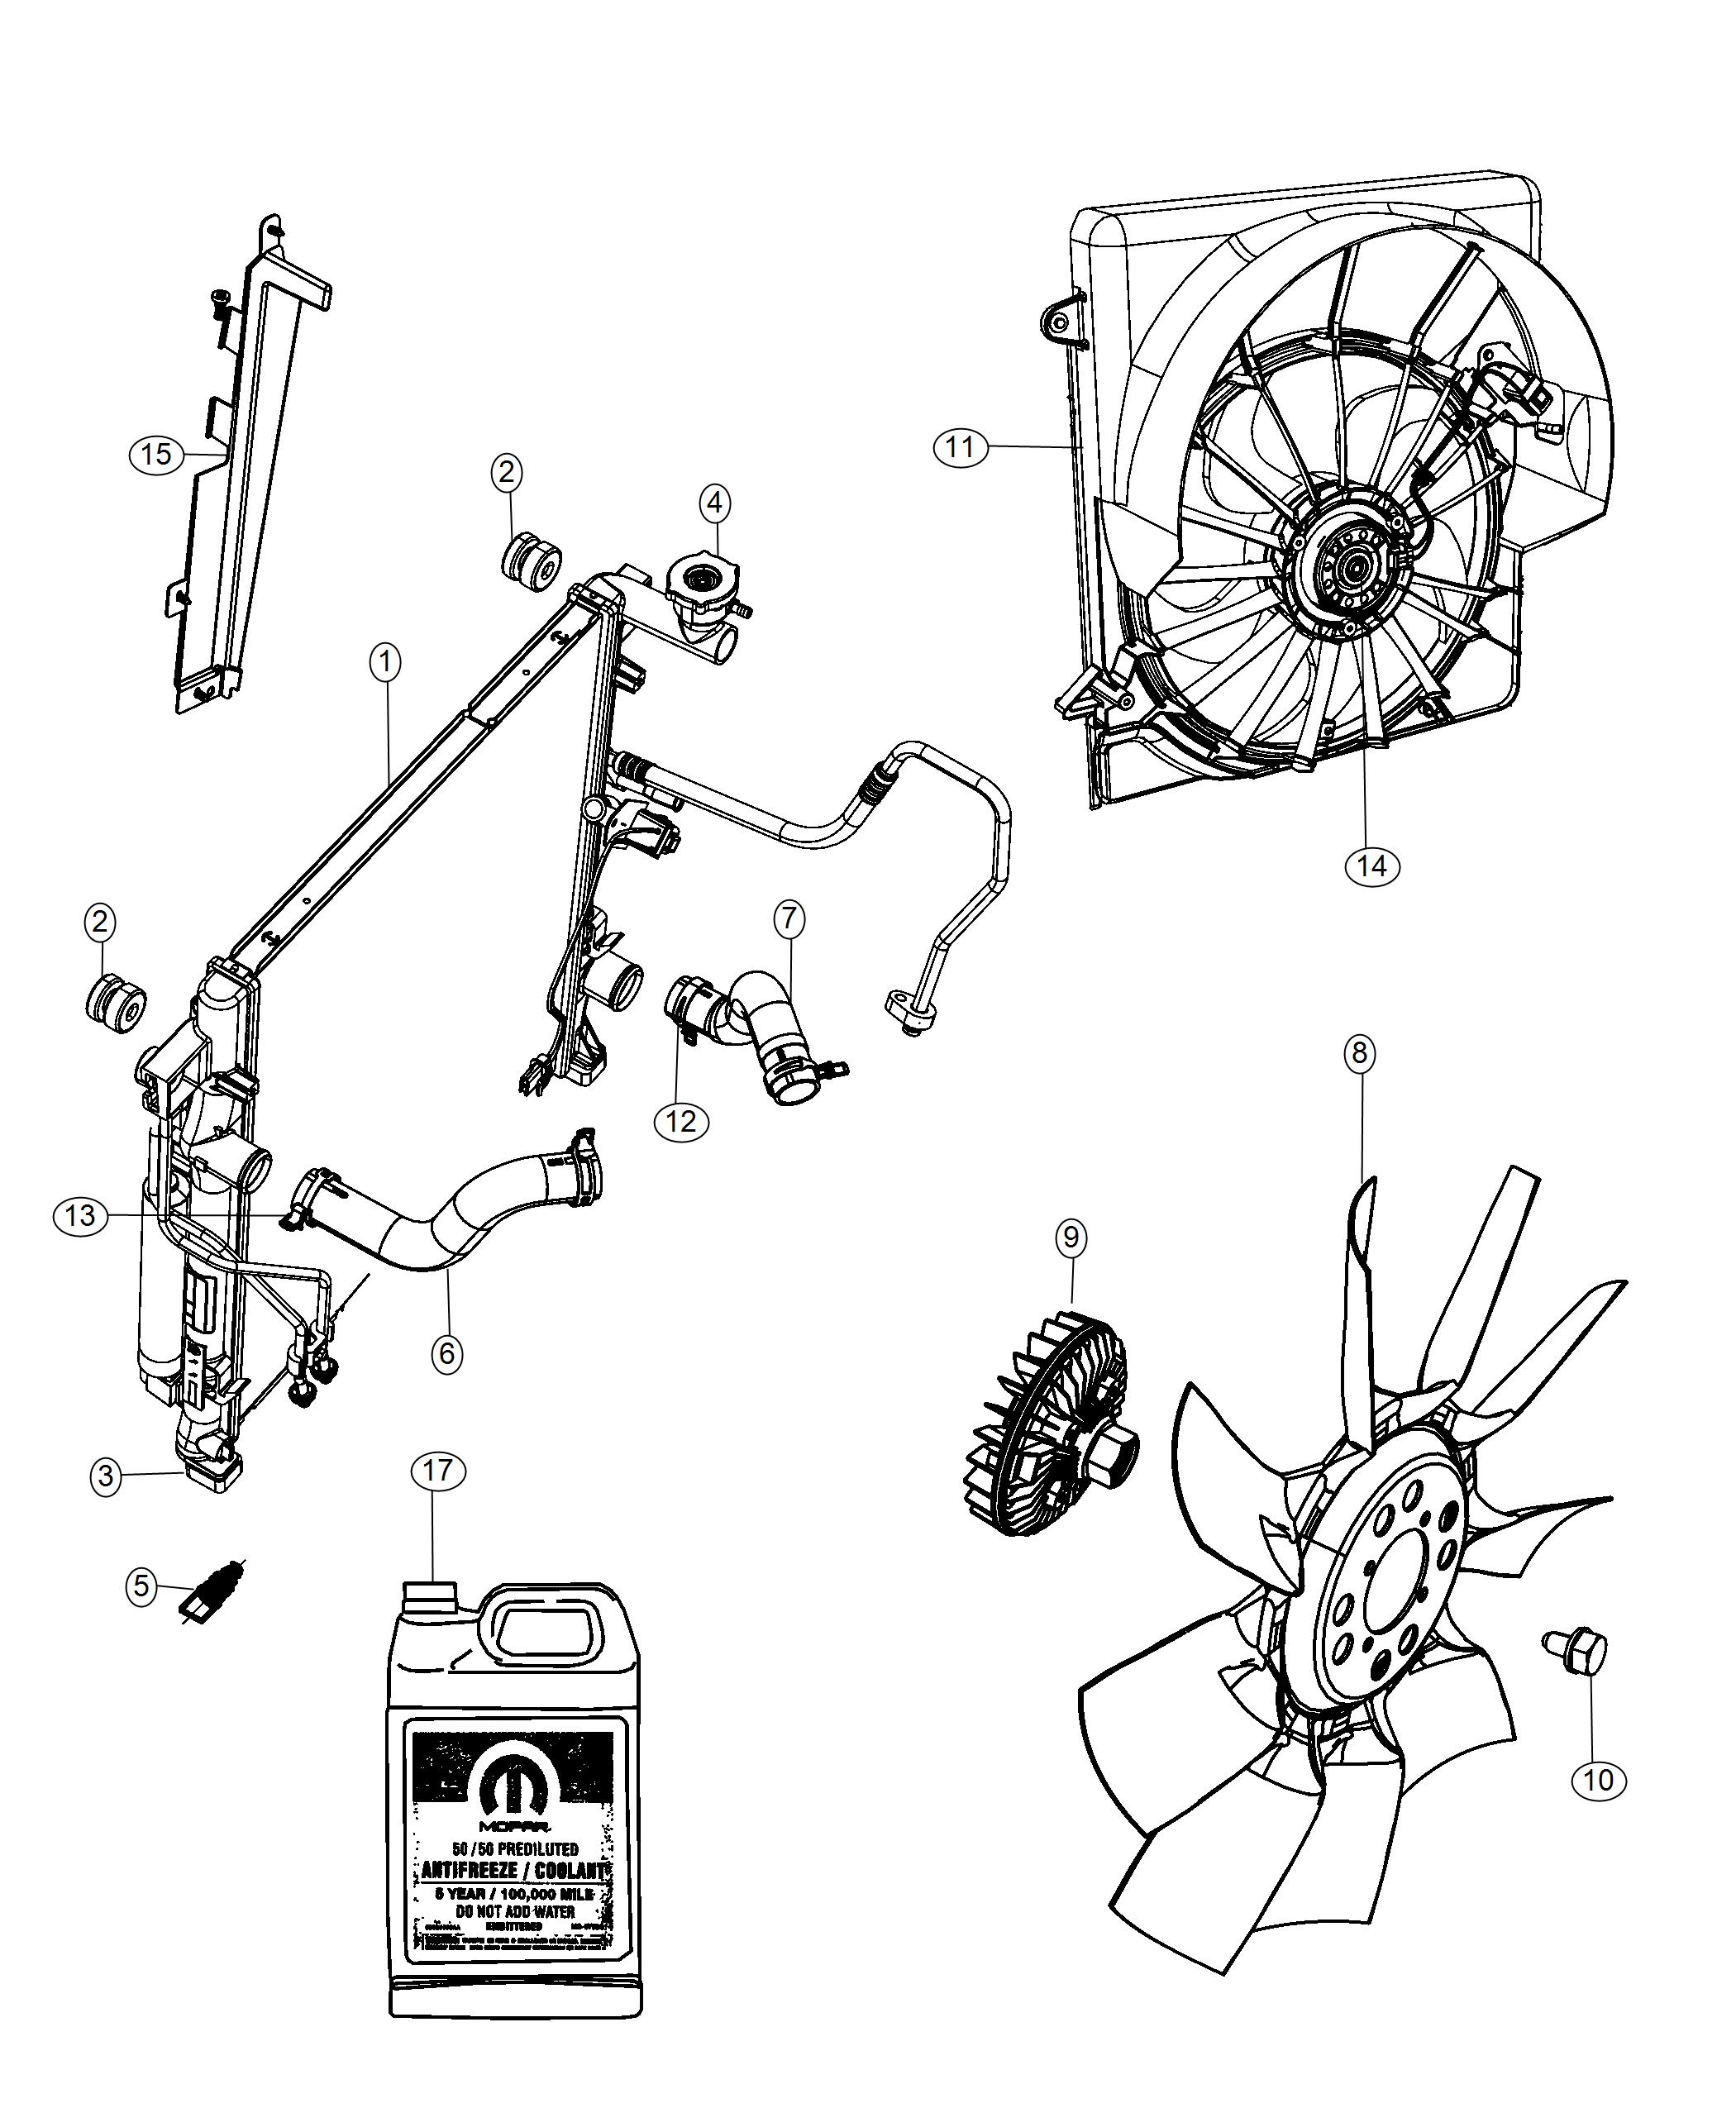 Jeep Liberty Clamp Radiator Hose Engine Side